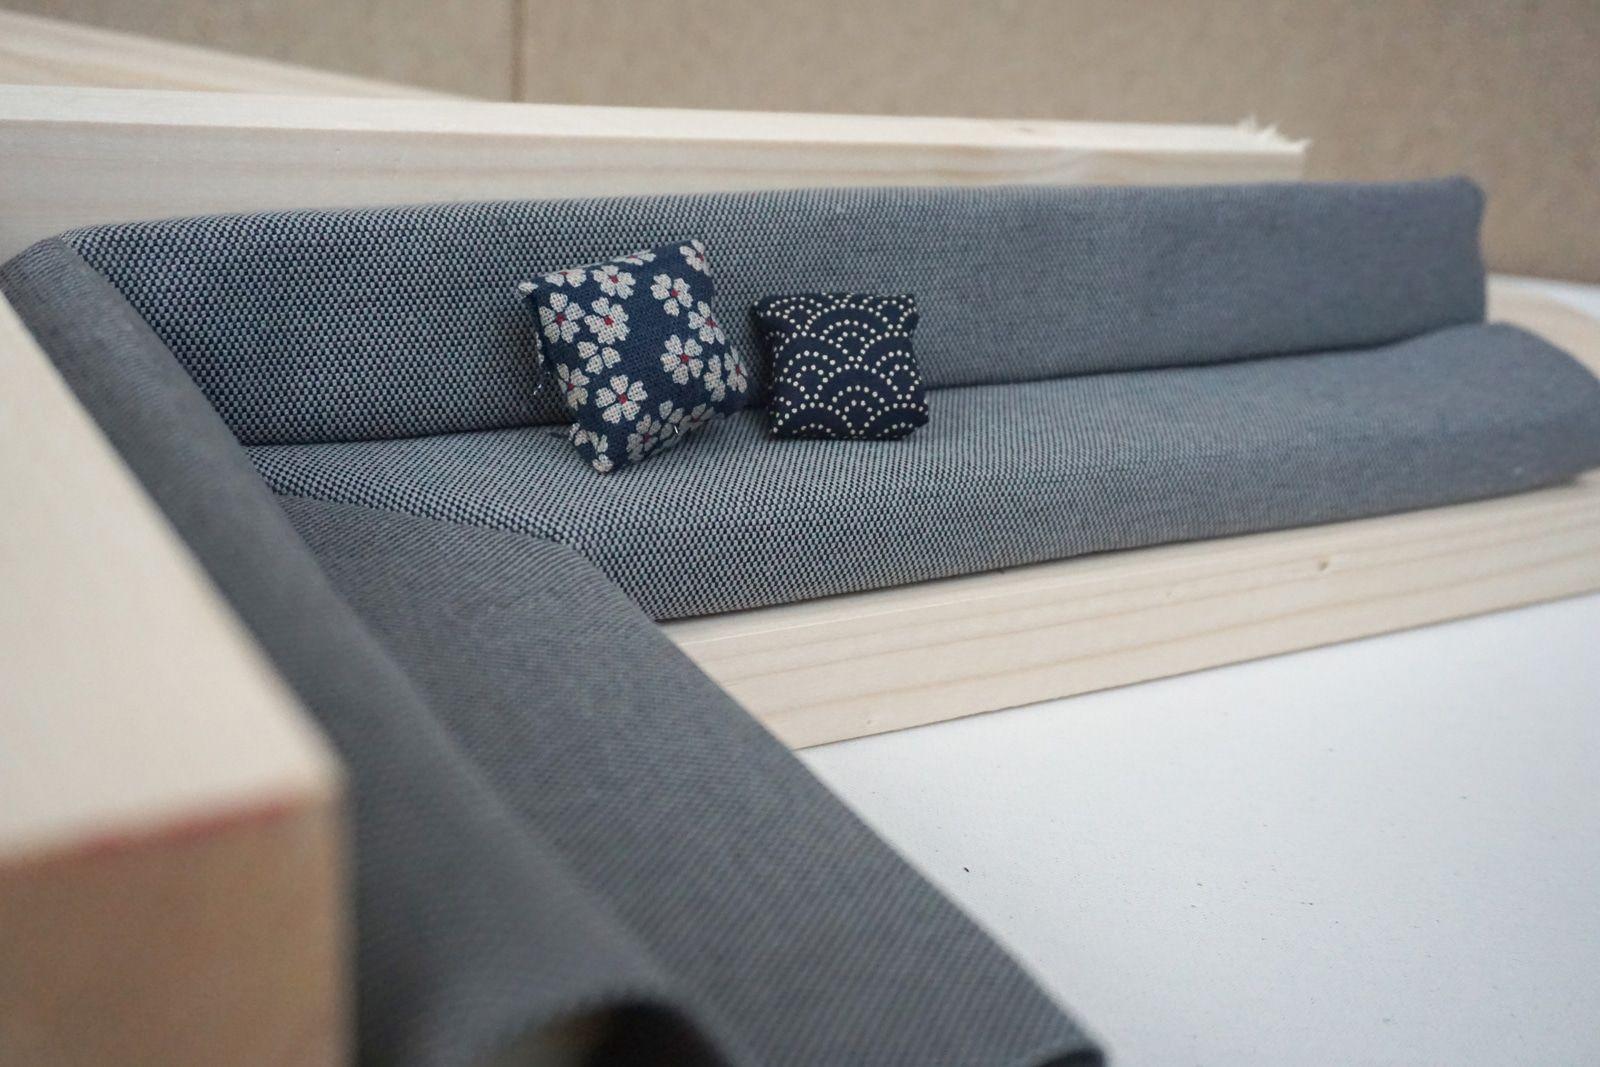 Maquette banquette angle miniature – Amenagement tapisserie Hana Bento